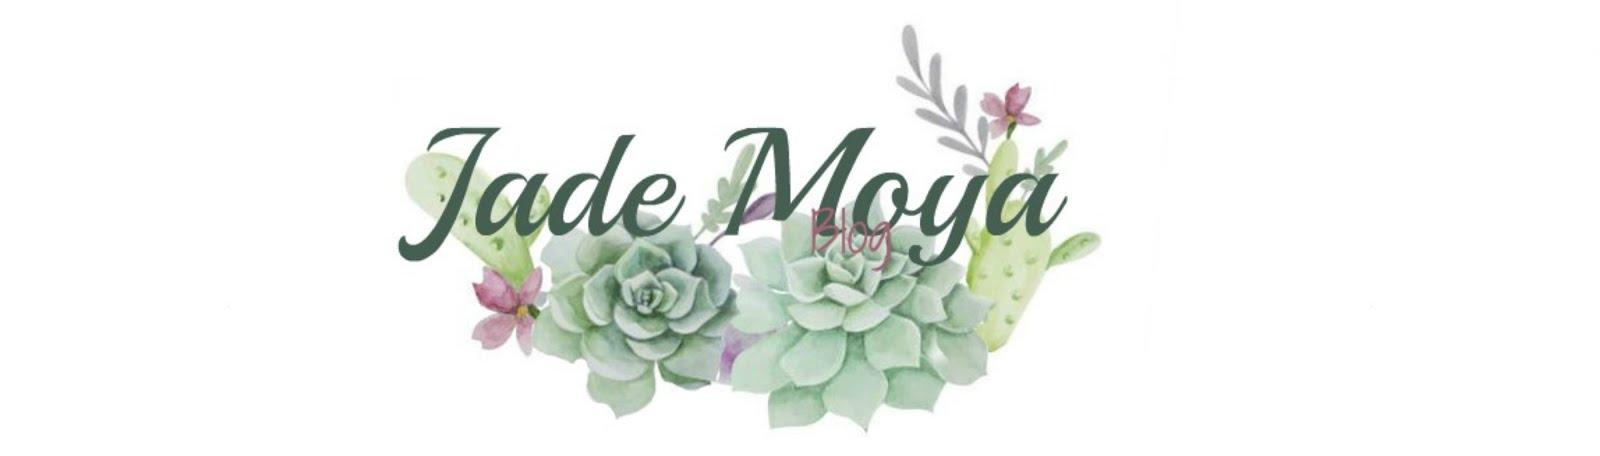 Jade Moya